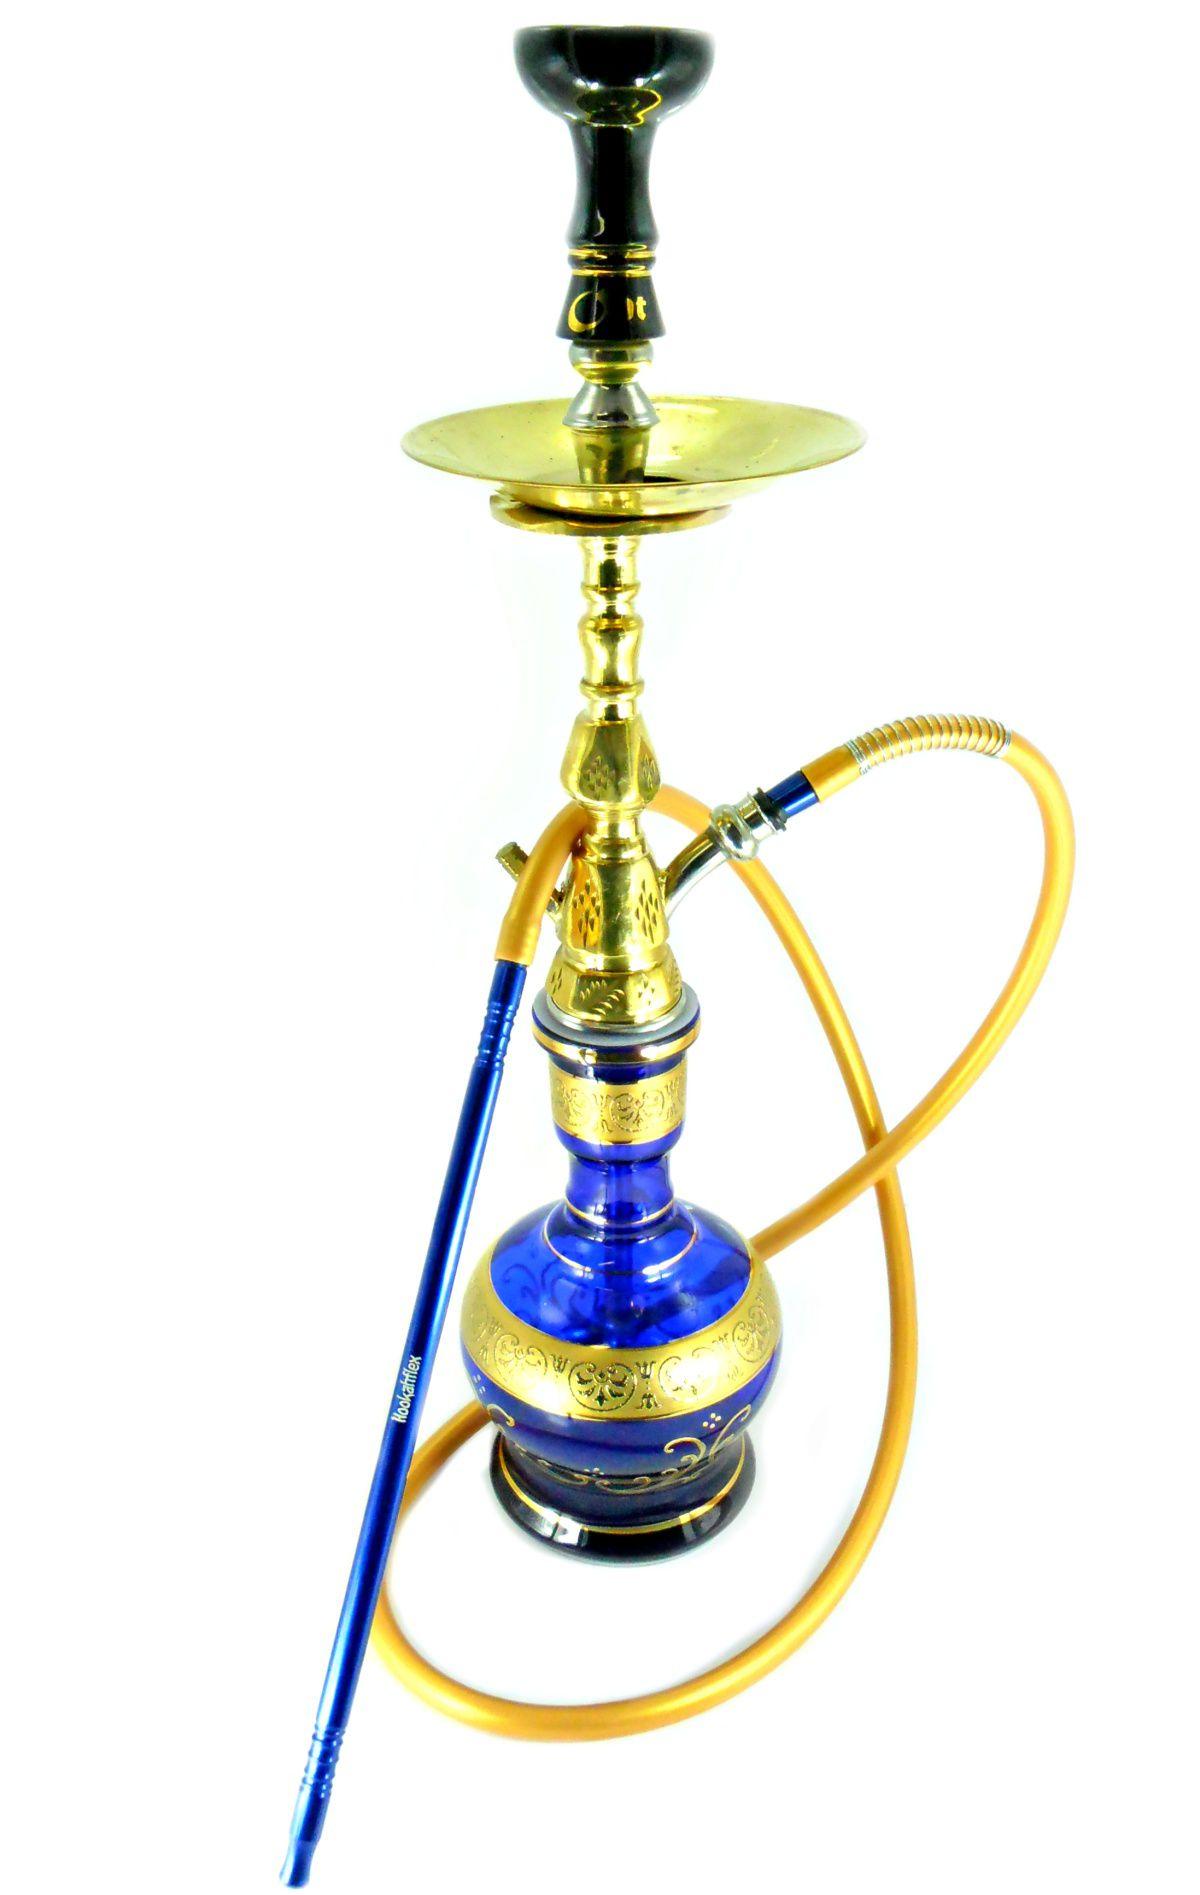 Narguile Egípcio PASHA KAMANJA 63cm, vaso Jumbo faixa grega, rosh OHT Gold e mangueira silicone, piteira alum.